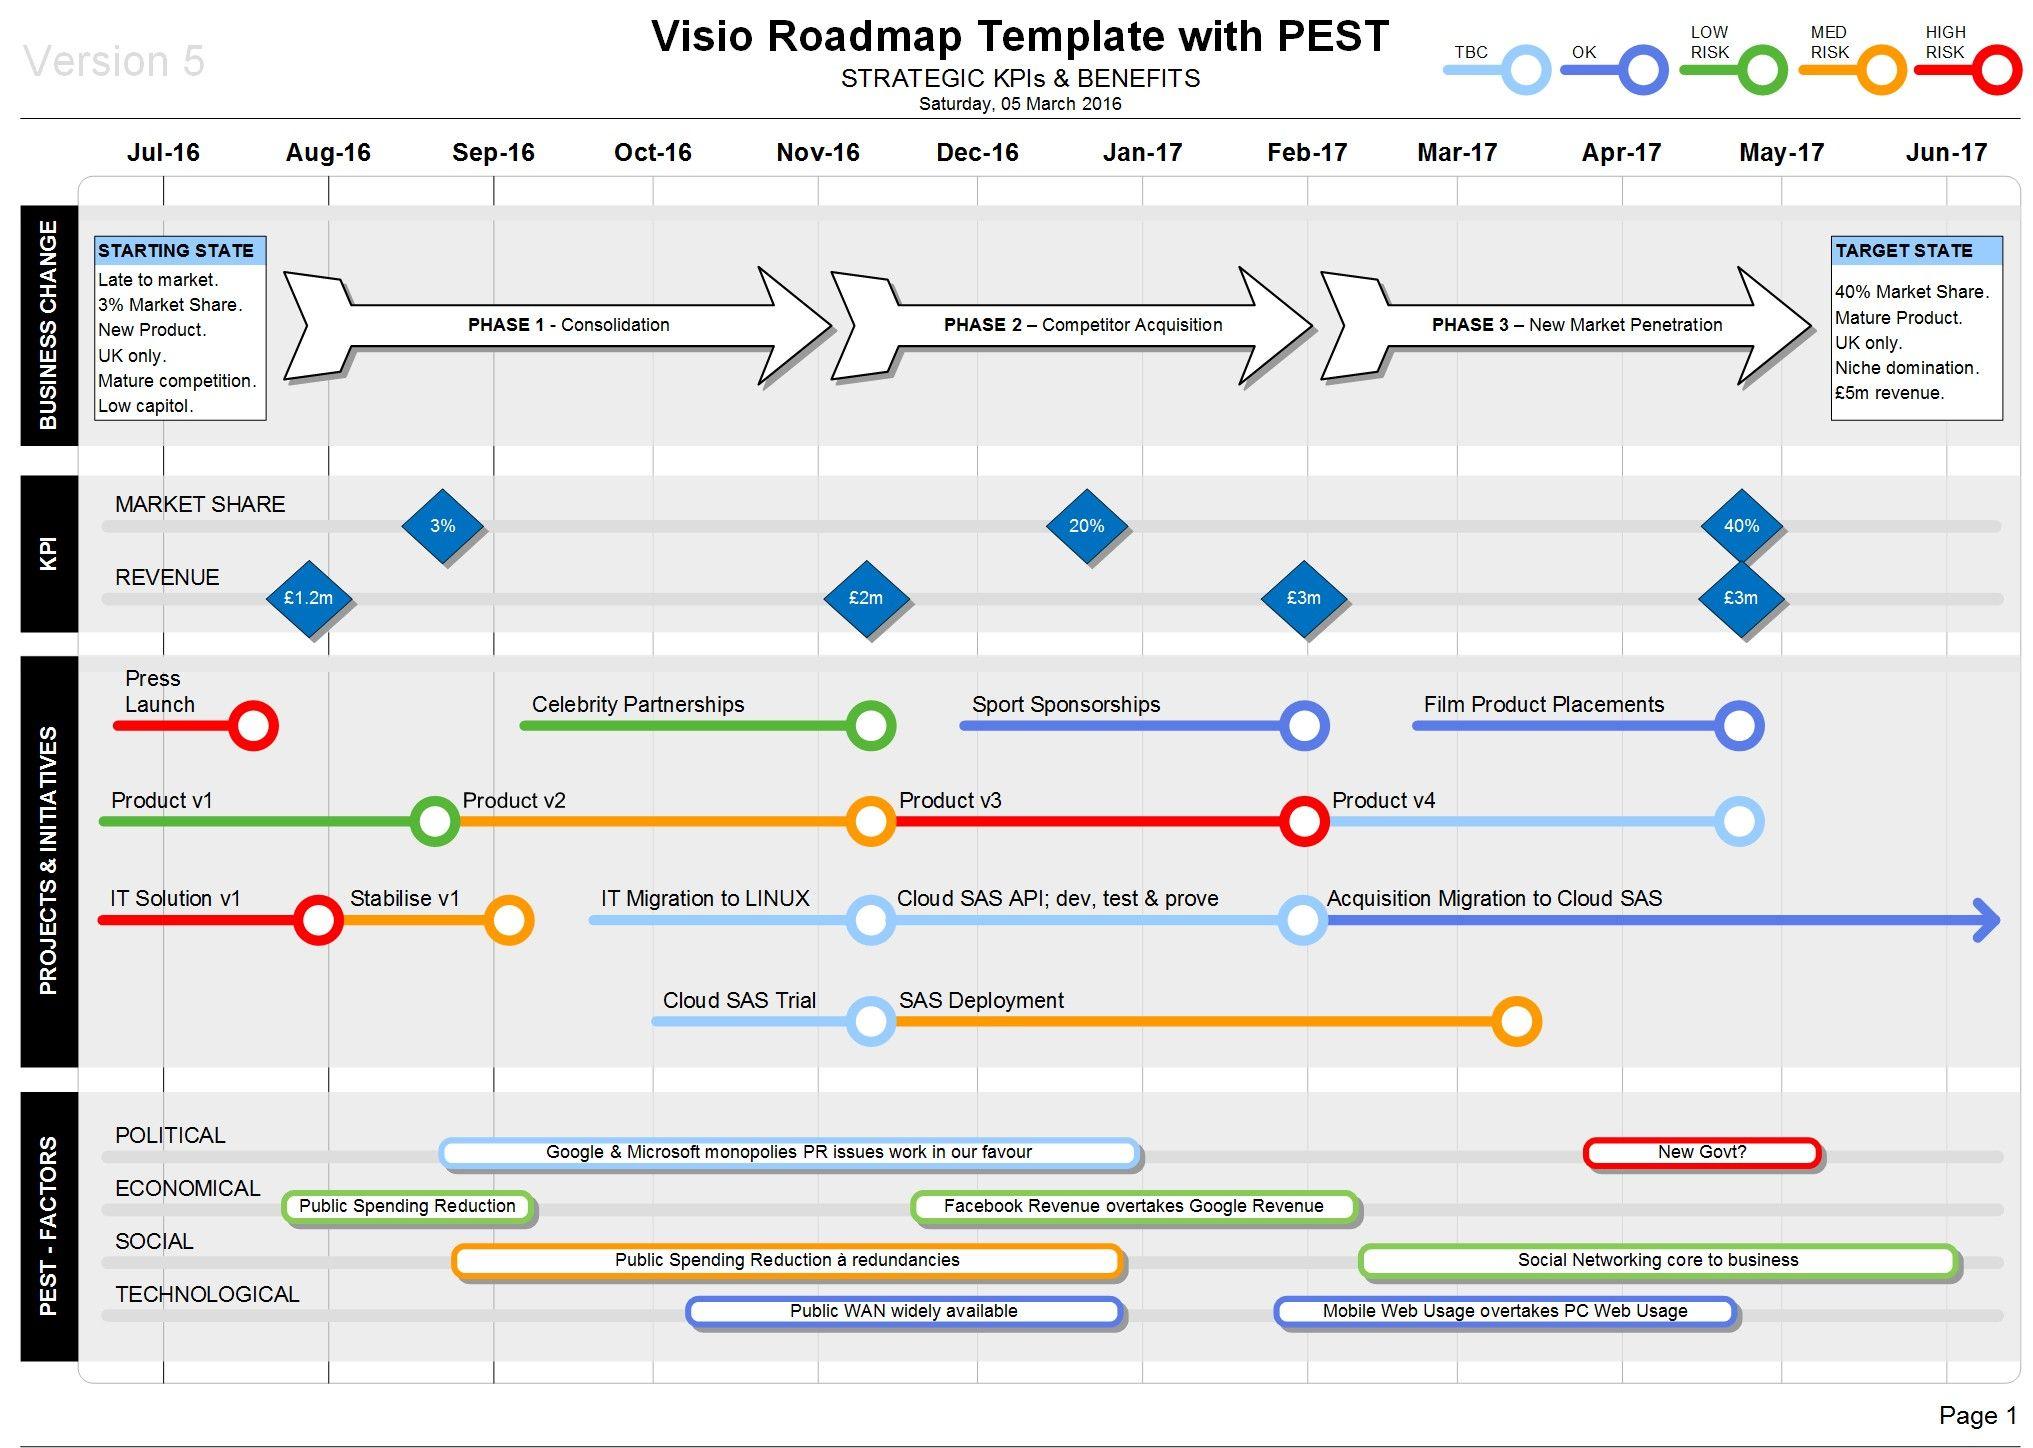 Sample Portfolio Roadmap Fresh This Visio Roadmap Template With